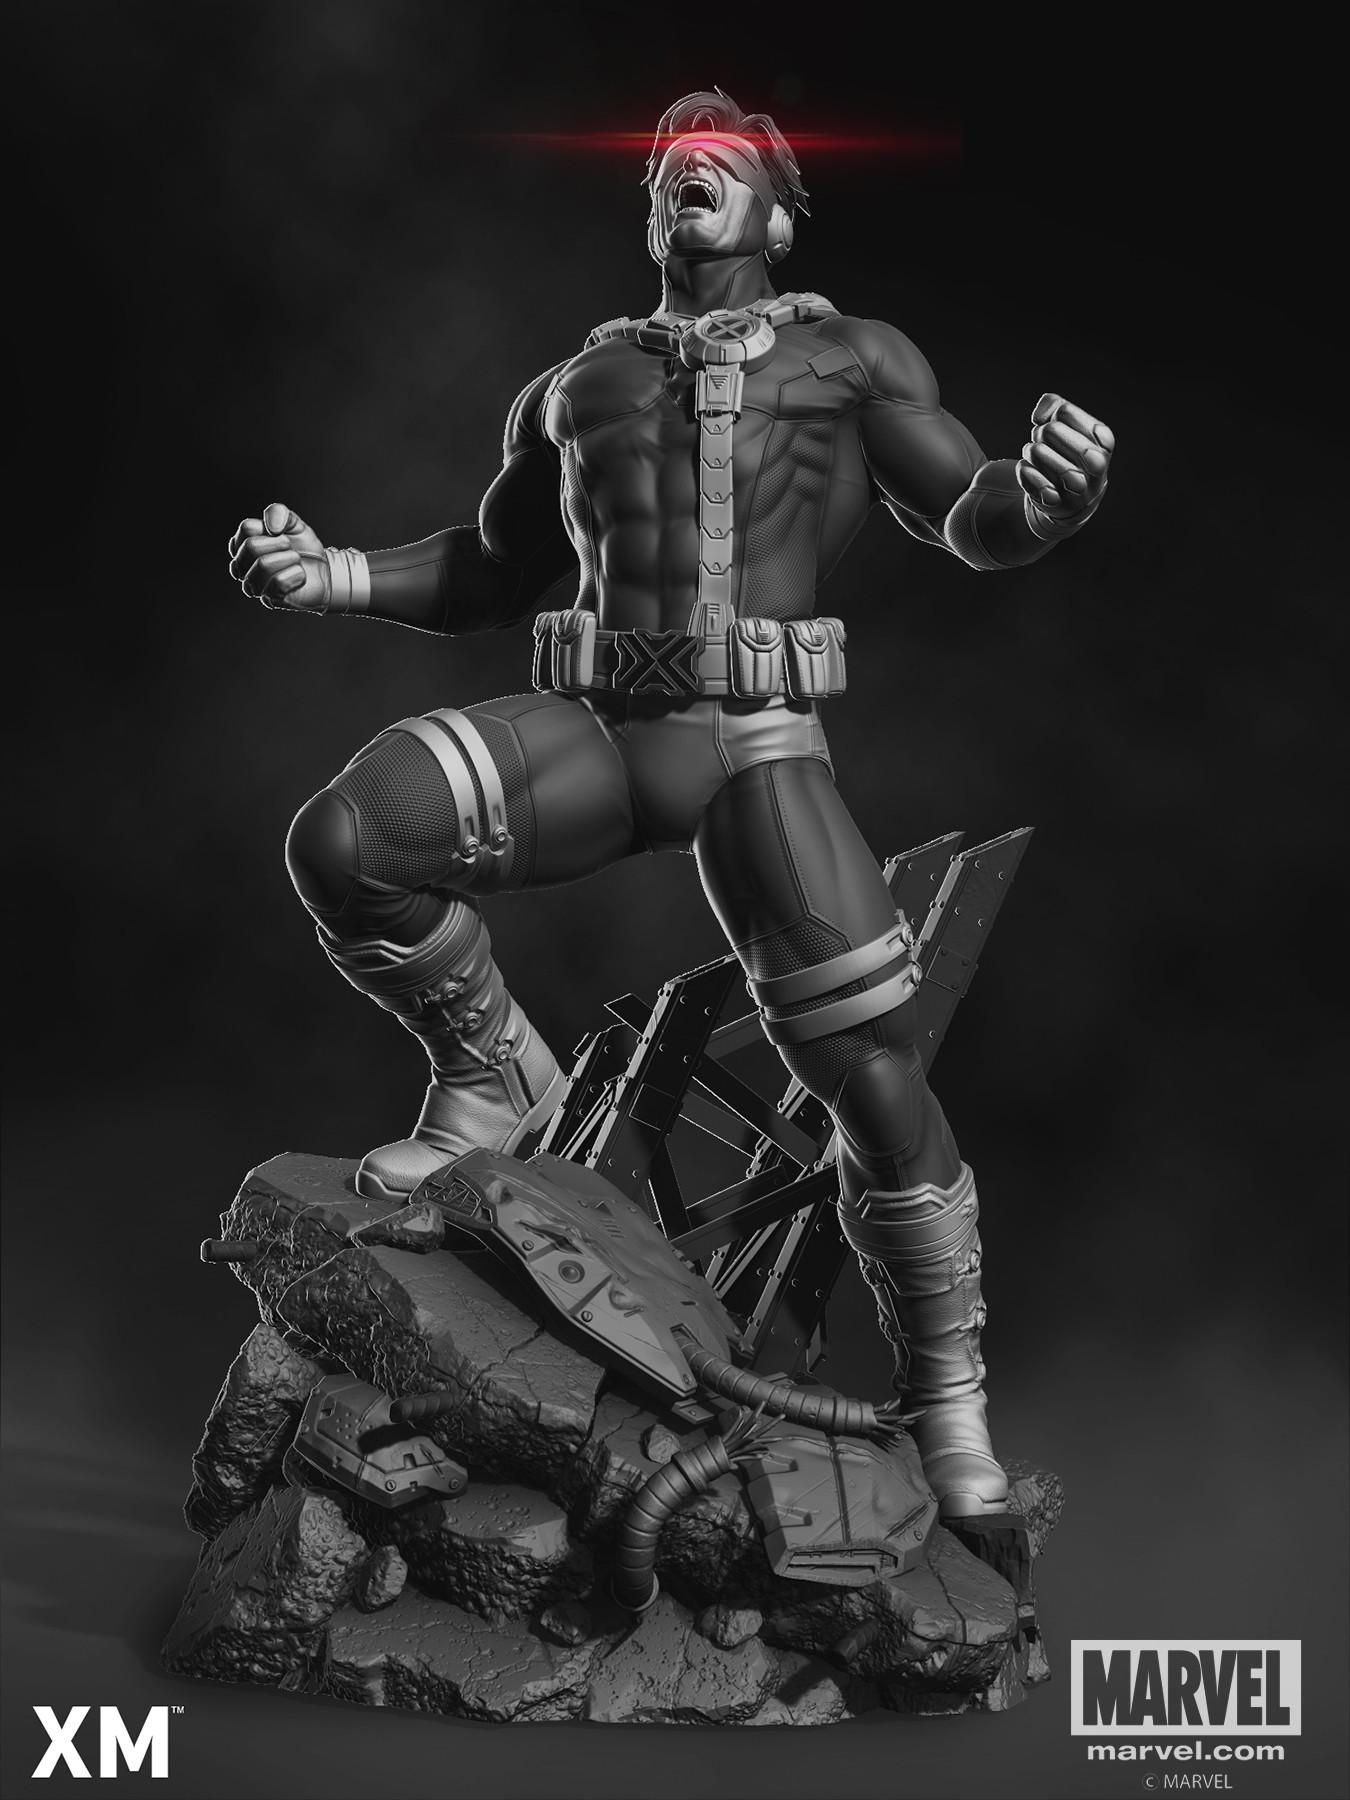 Rafael mustaine cyclops promo render 2